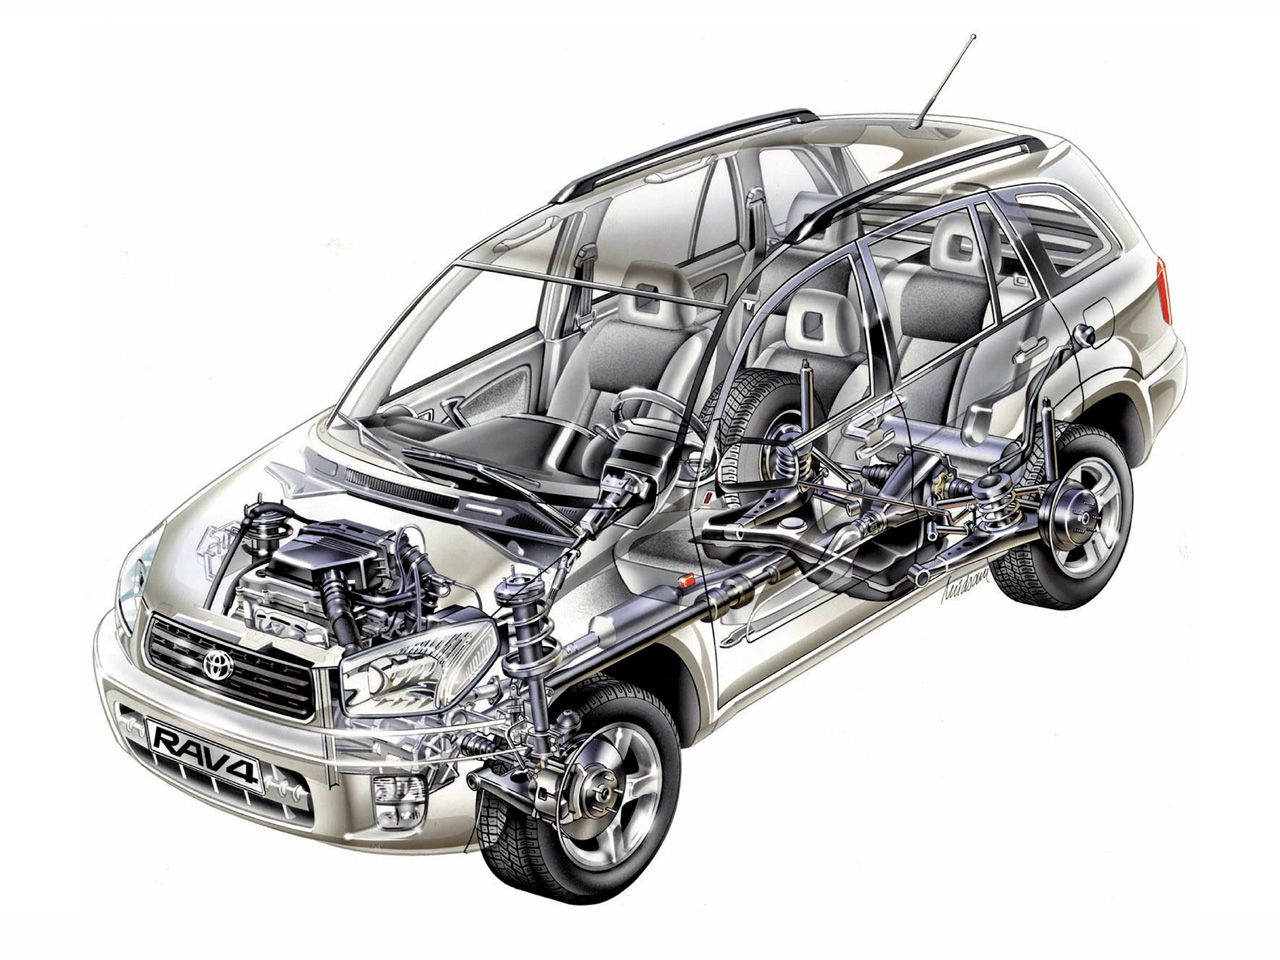 2003-2005 Toyota RAV4 5-door - Illustrator\'s name illegible ...